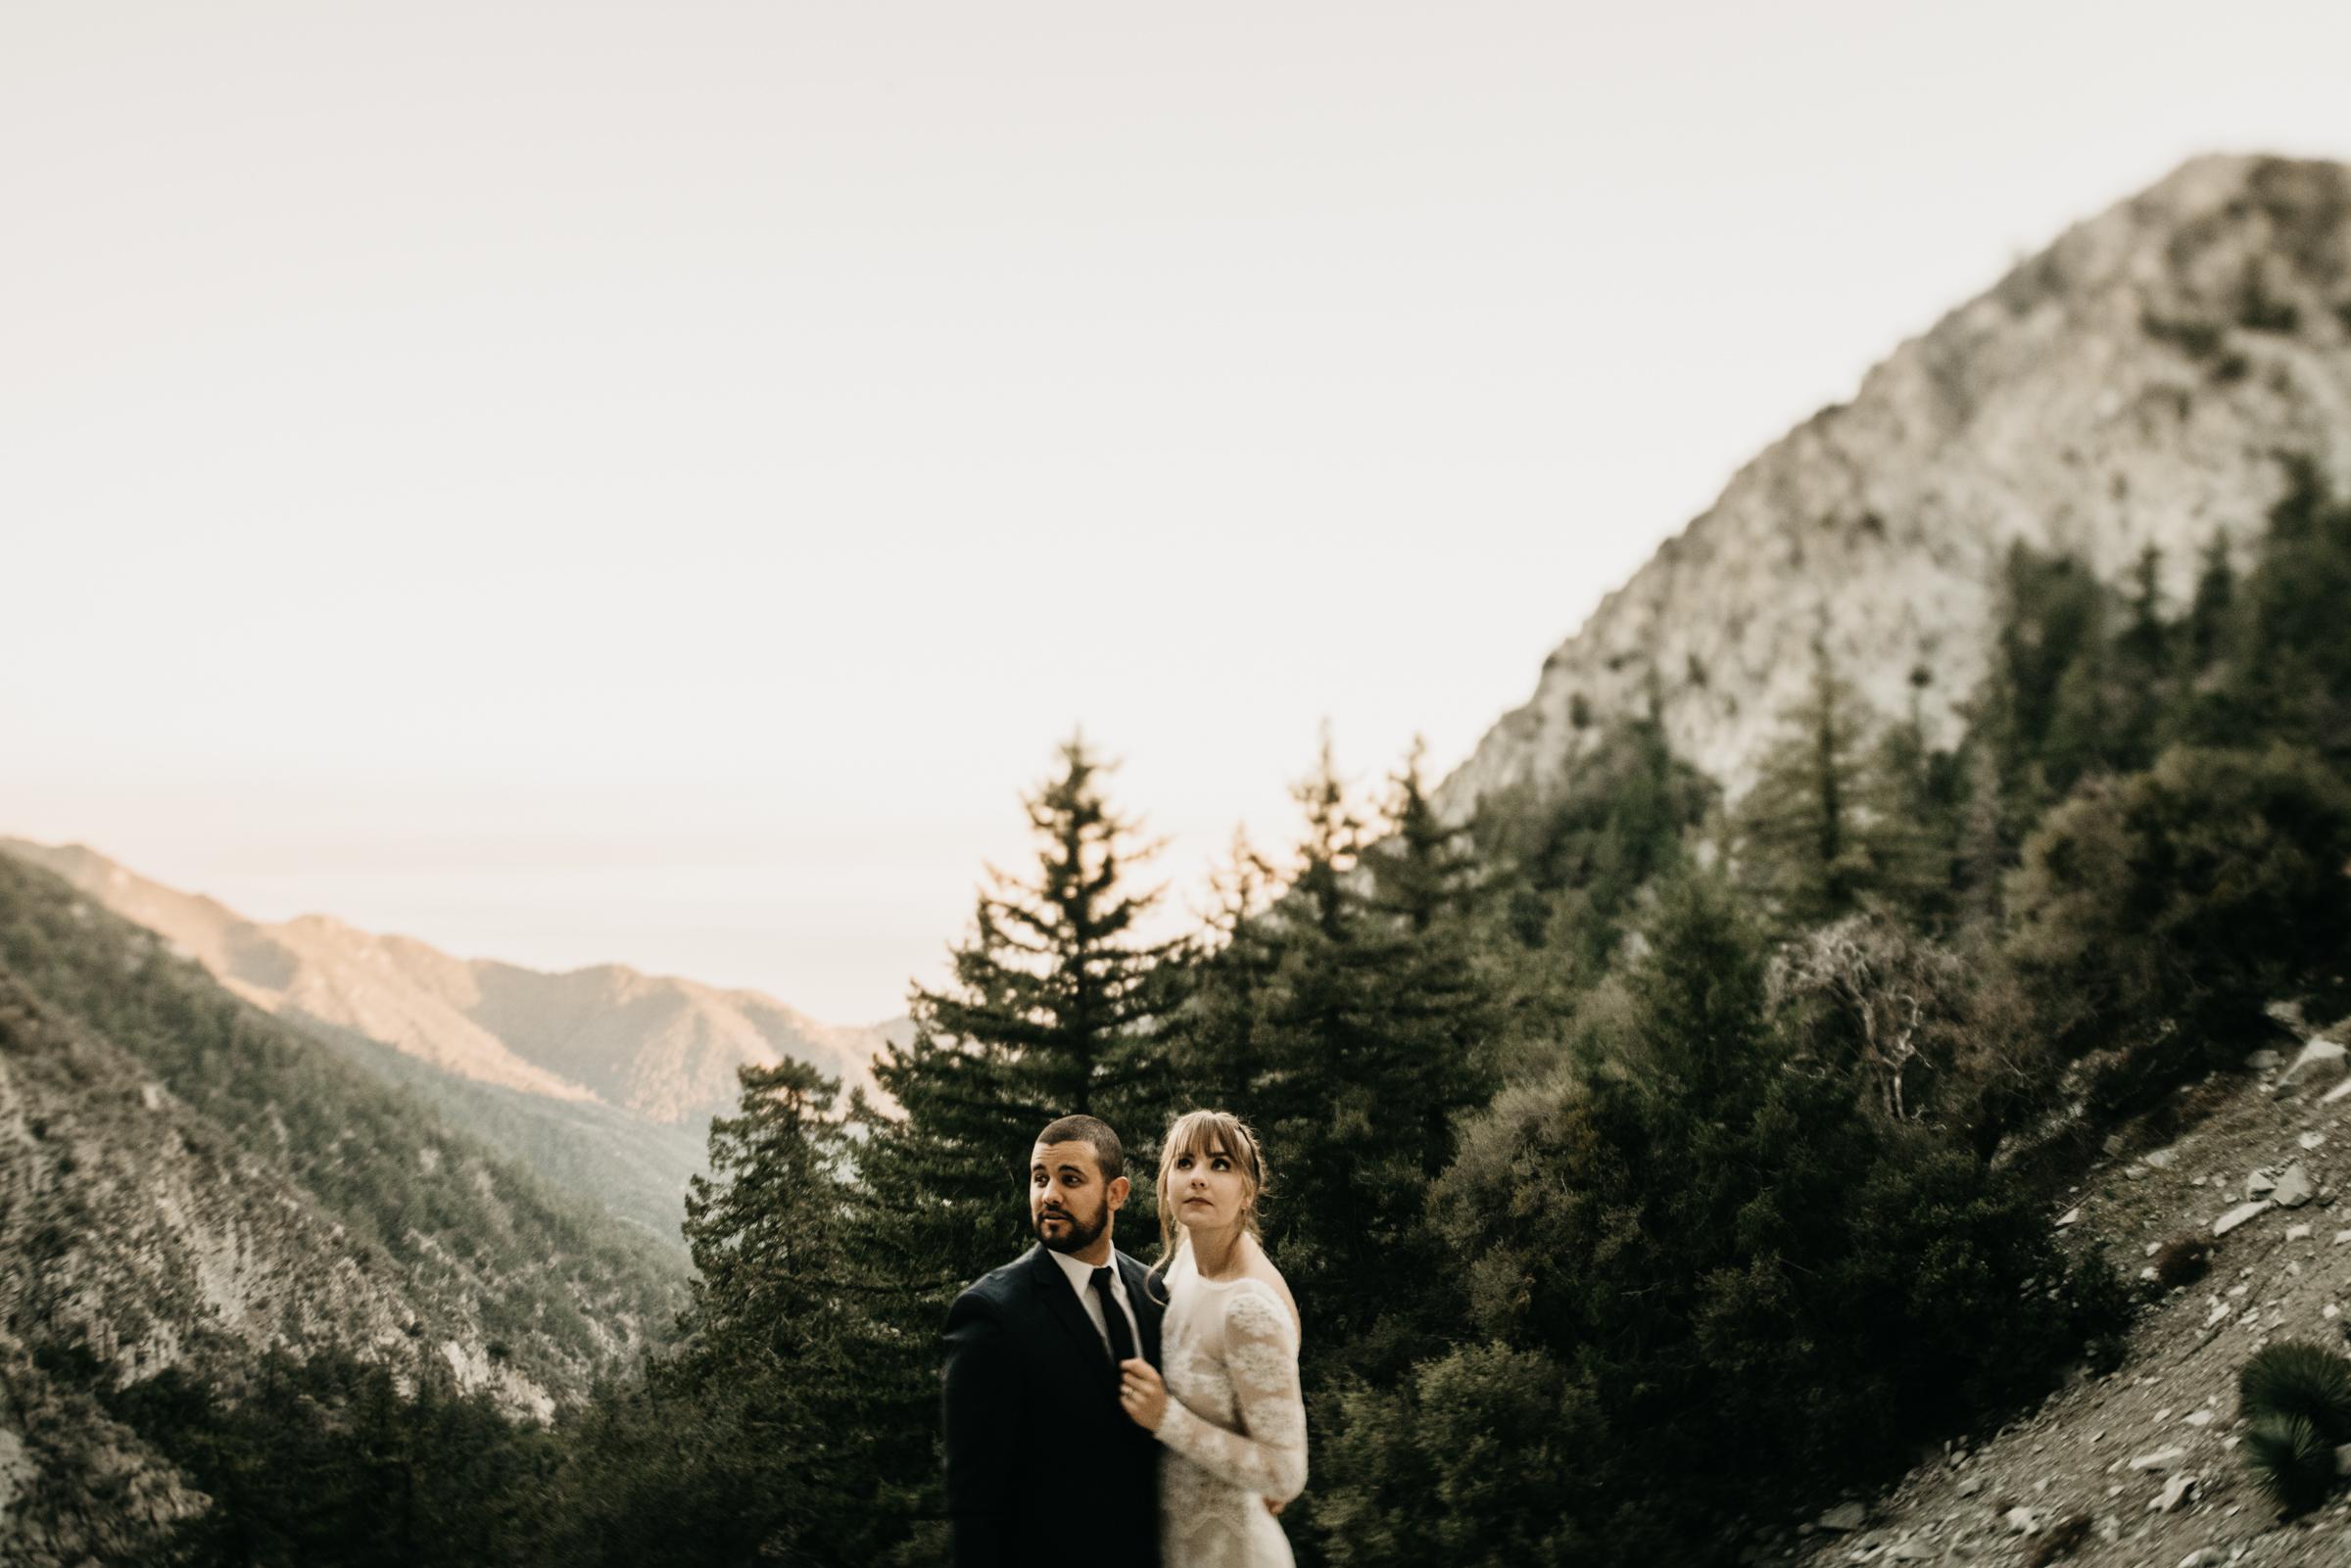 ©Isaiah + Taylor Photography - Los Angeles Wedding Photographers - Los Angeles Forest Wedding -90.jpg